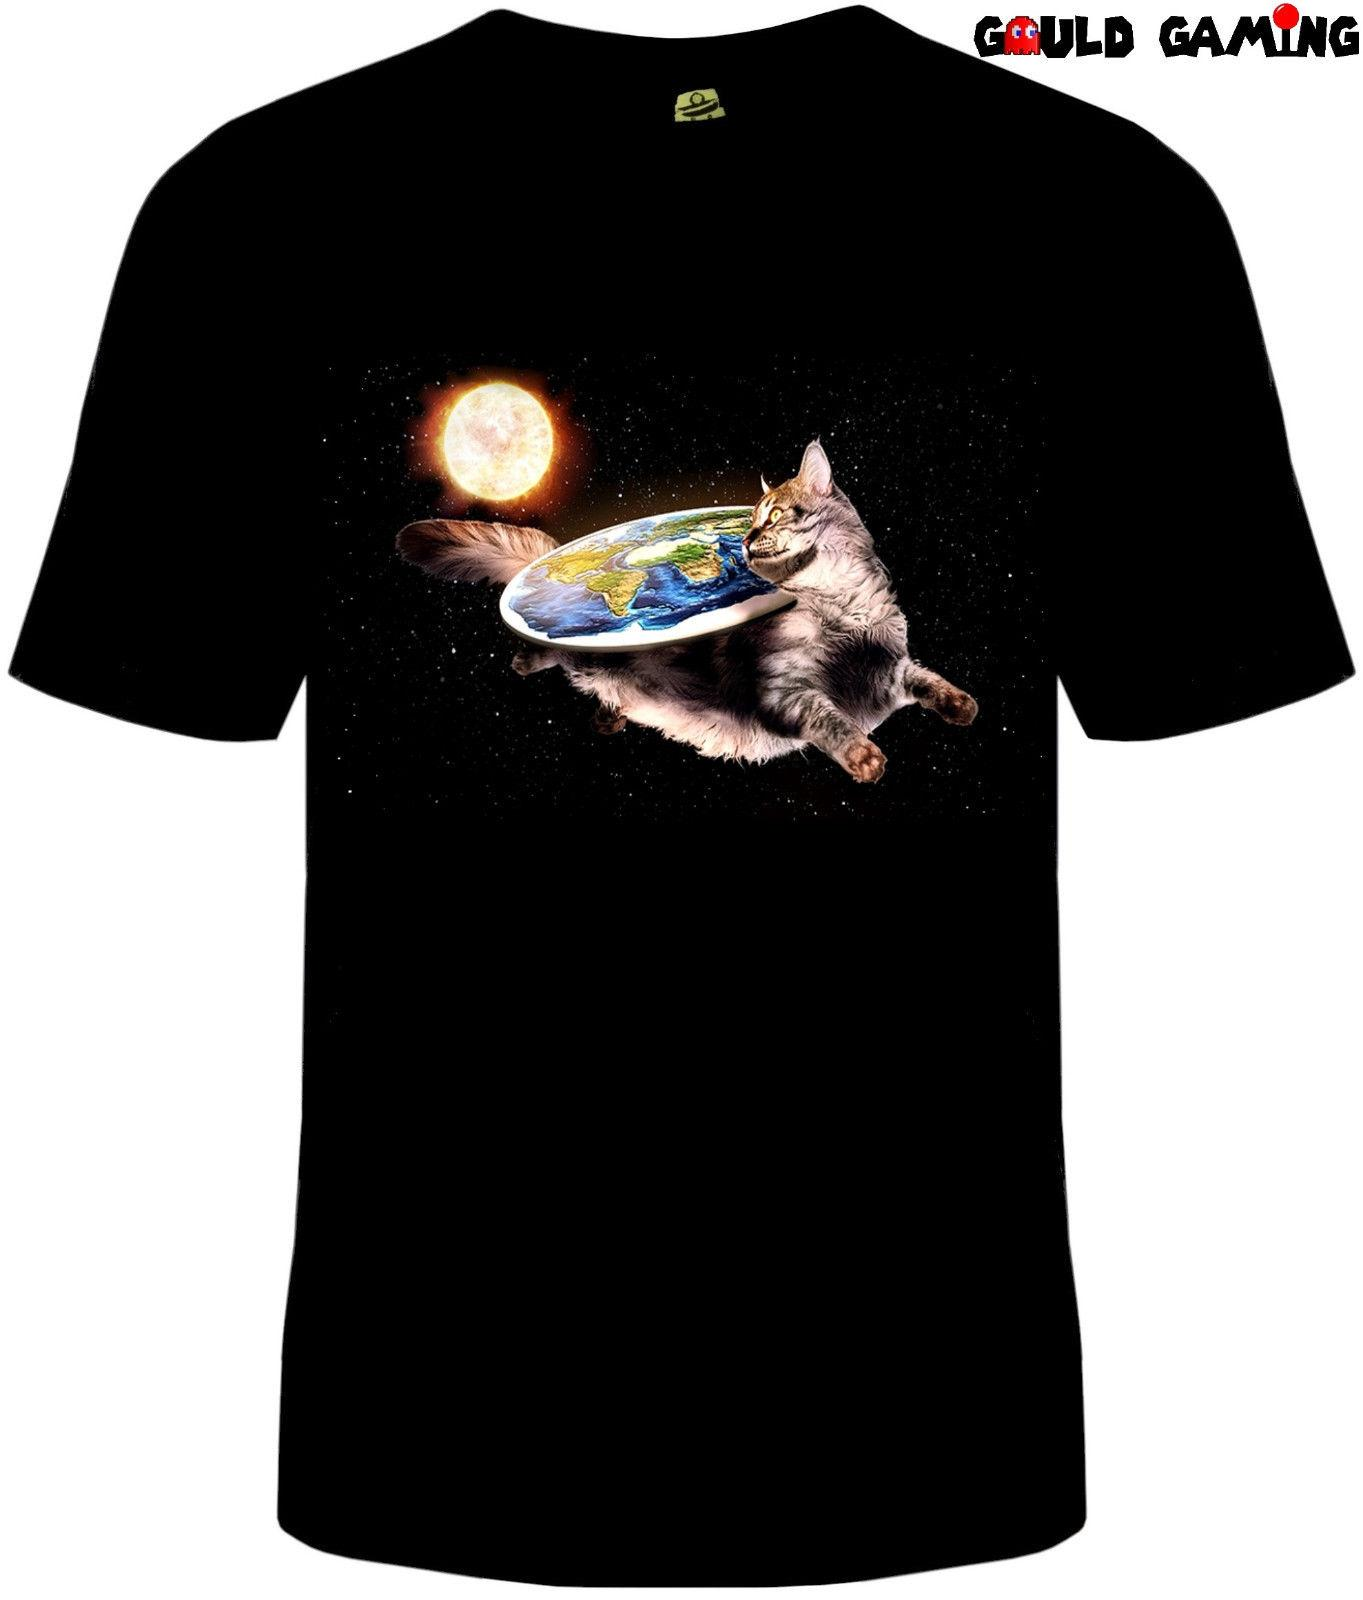 c04d6203 Cat In Space Flat Earth T Shirt Unisex Adult Funny Sizes Cotton NASA Scheol  New Men Women Unisex Fashion Tshirt Denim Shirts Design T Shirts From ...